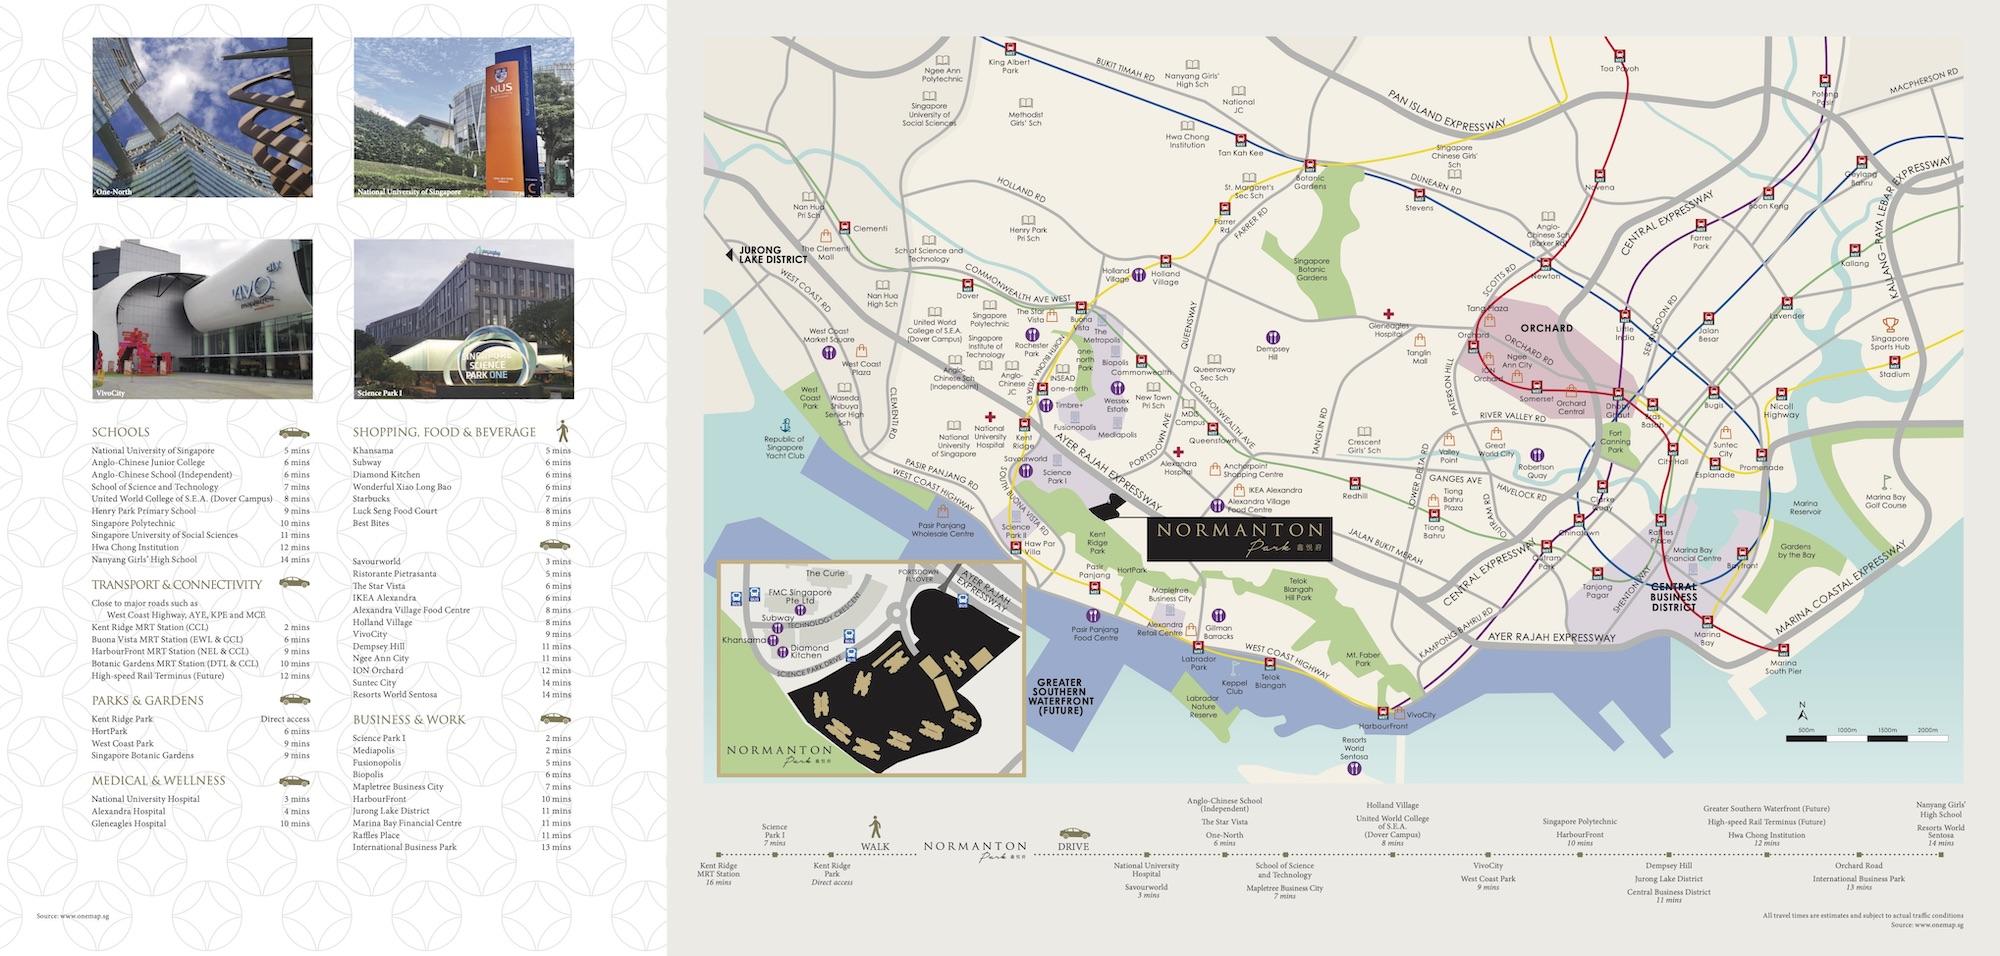 Normanton-Park-new-condo-singapore-location-map